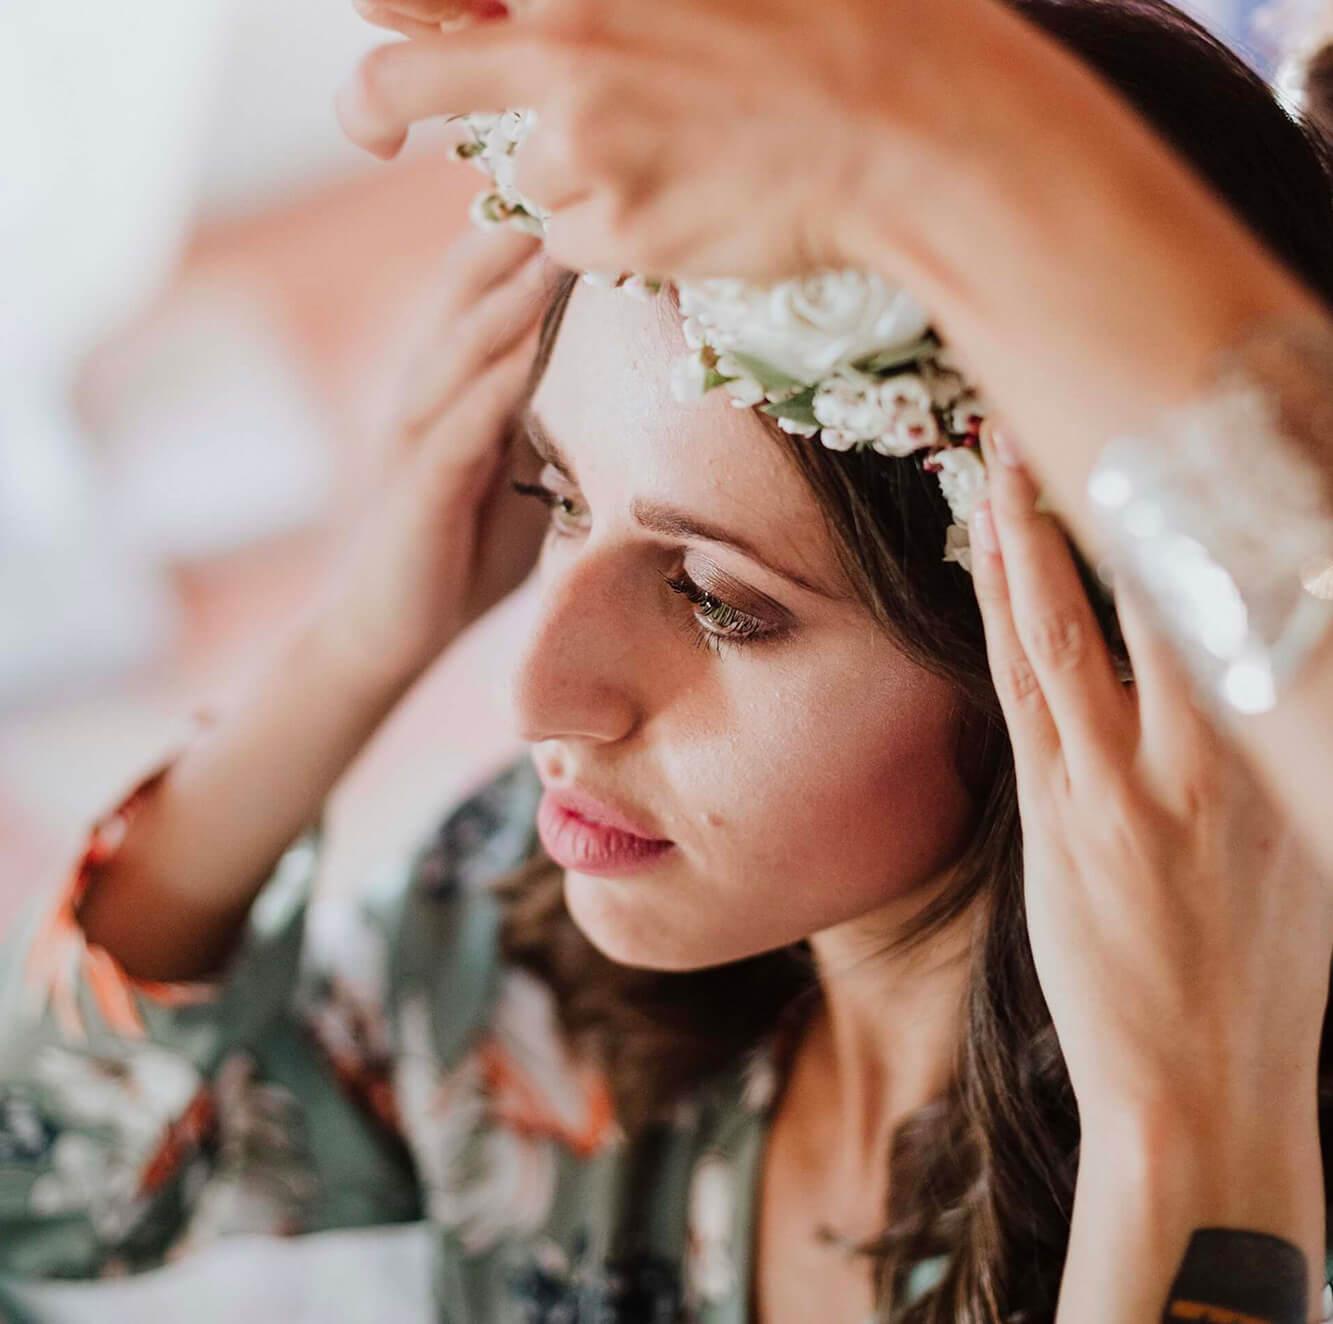 Hair Stylists for the bride, wedding in Tuscany. Giulia Alessandri Wedding Planner, Wedding Design & Wedding Coordination in Tuscany.